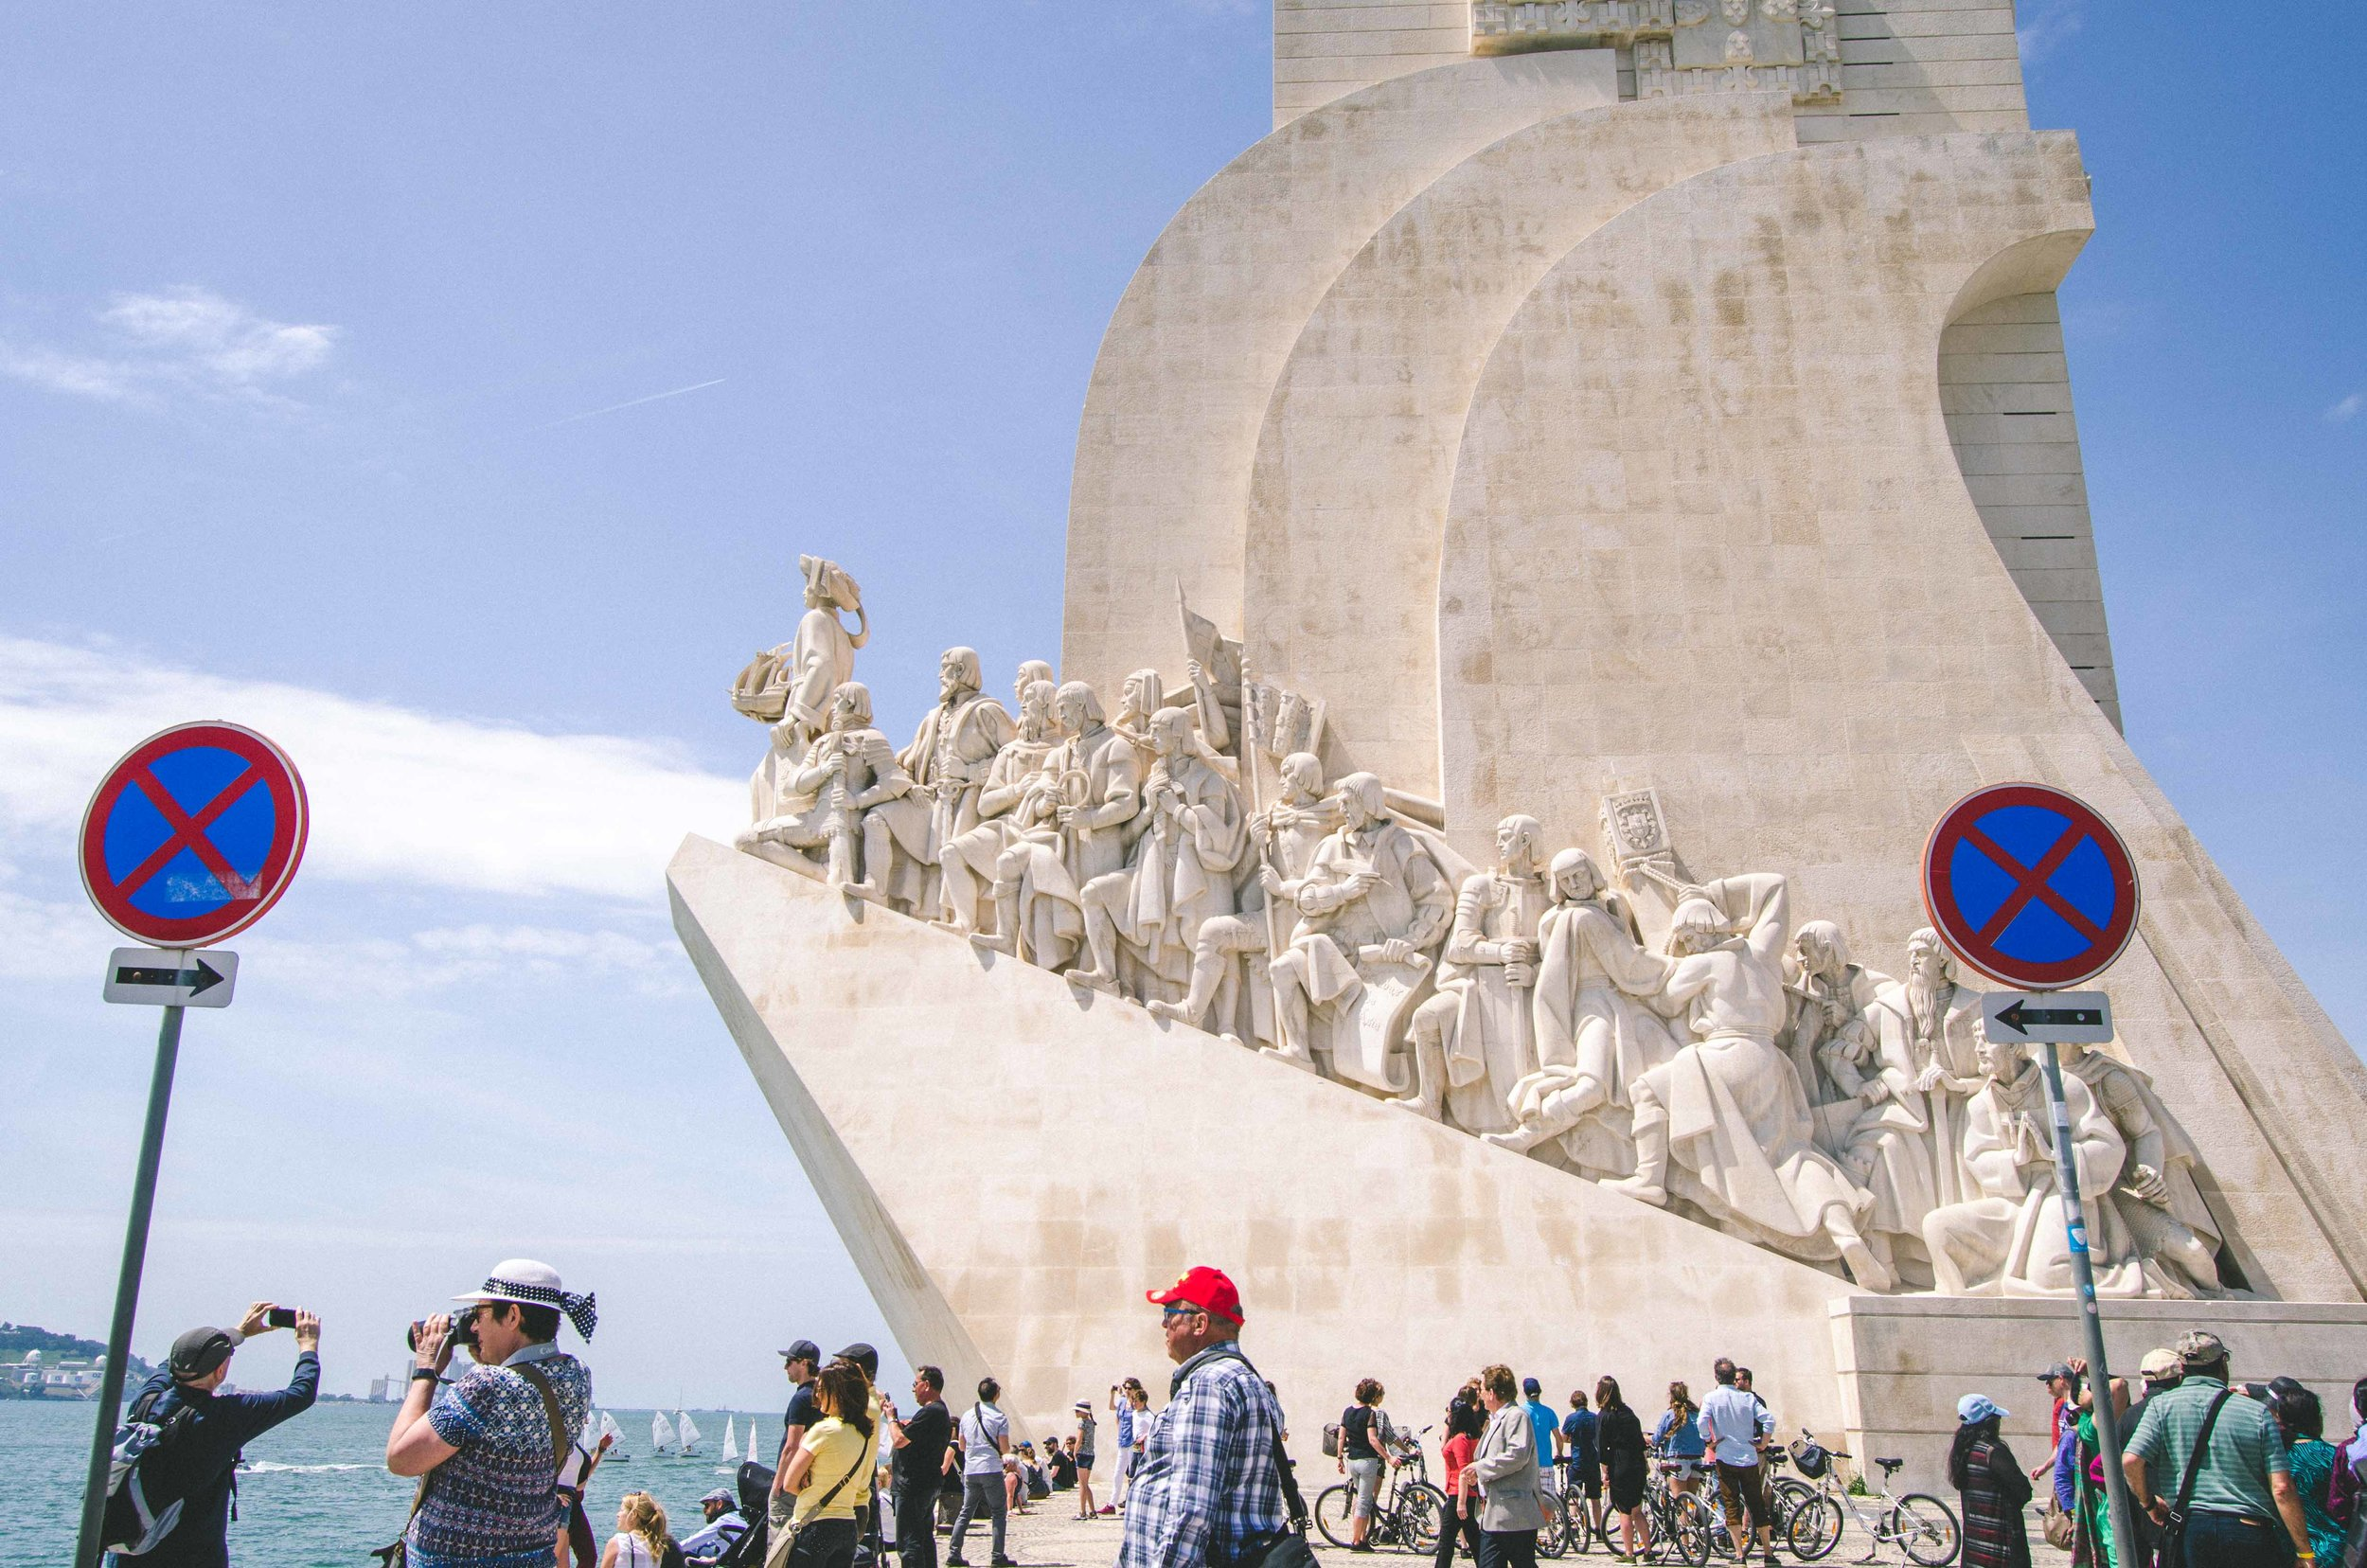 Padrão dos Descobrimentos, monument to the Portugal's hand in the Age of Discovery